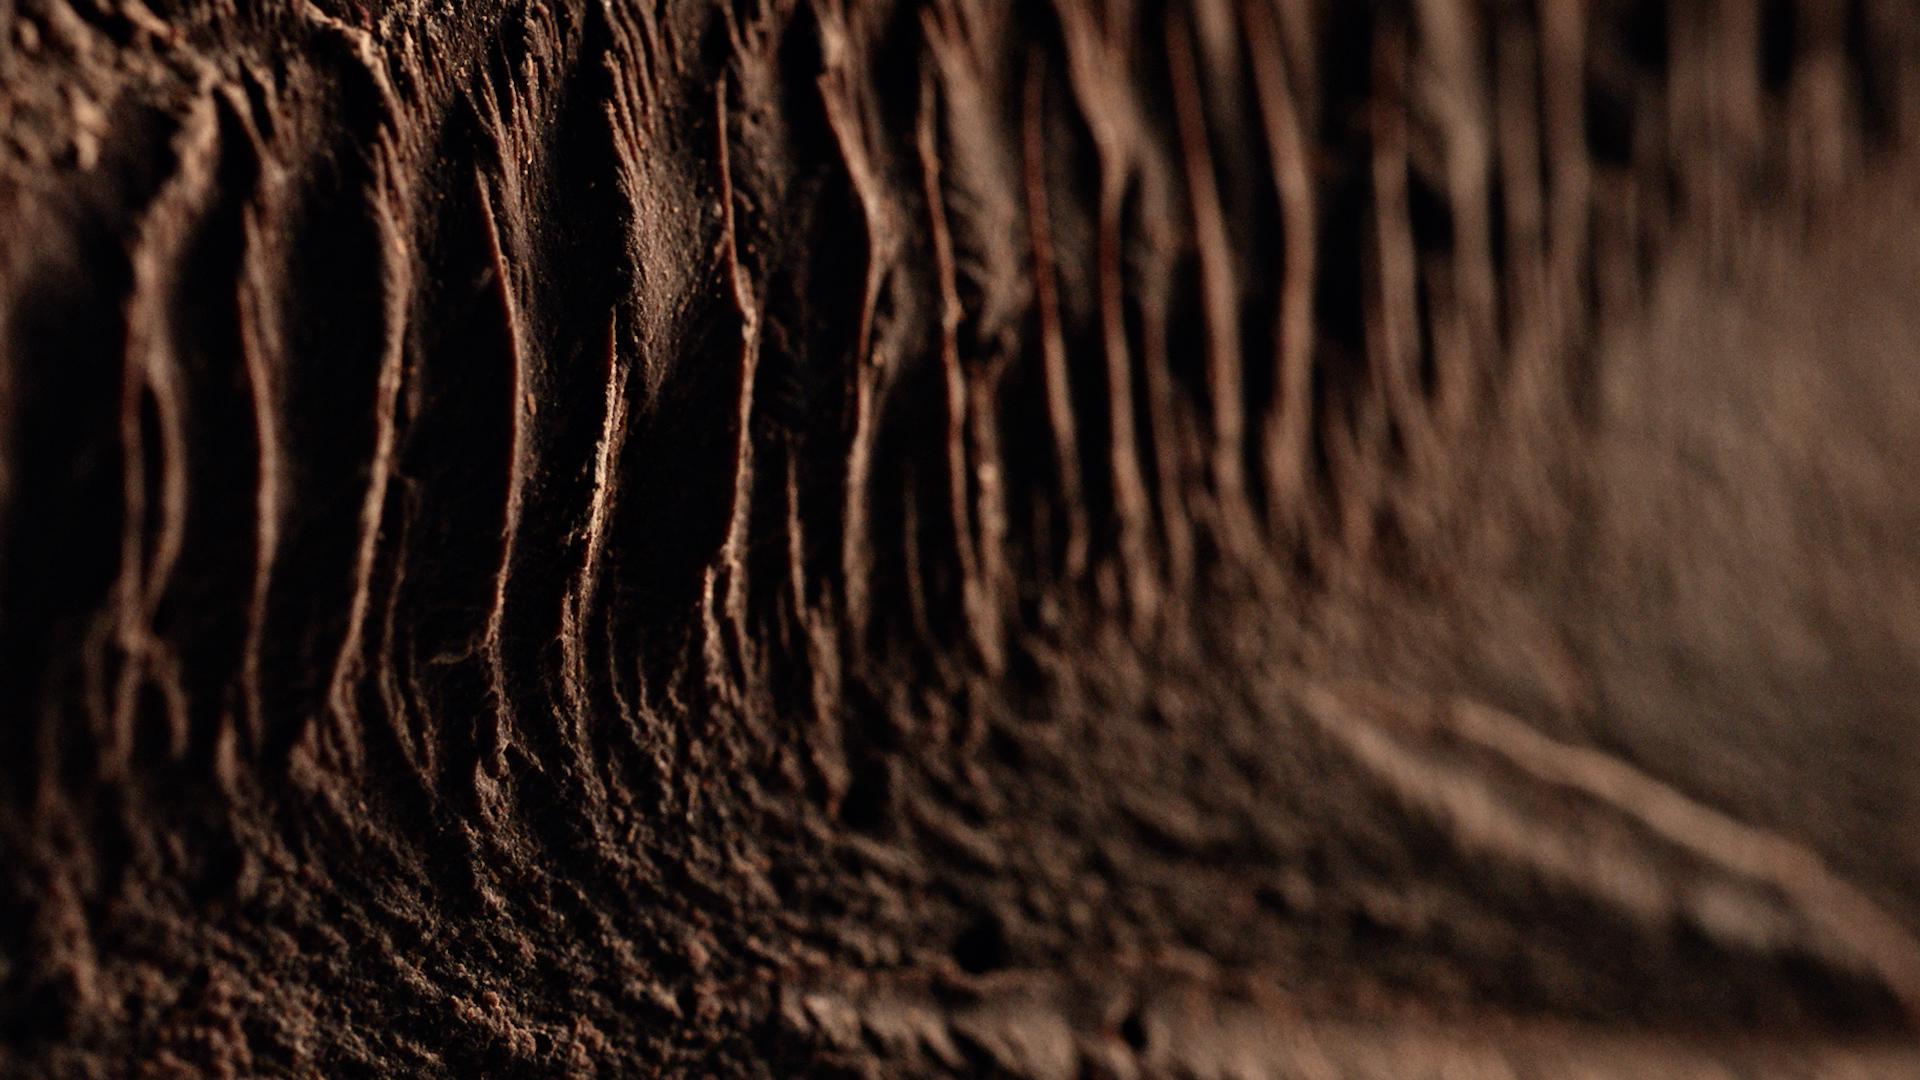 portfolio/theartofchocolate/chocolate_jorrit-stollman_20.jpg